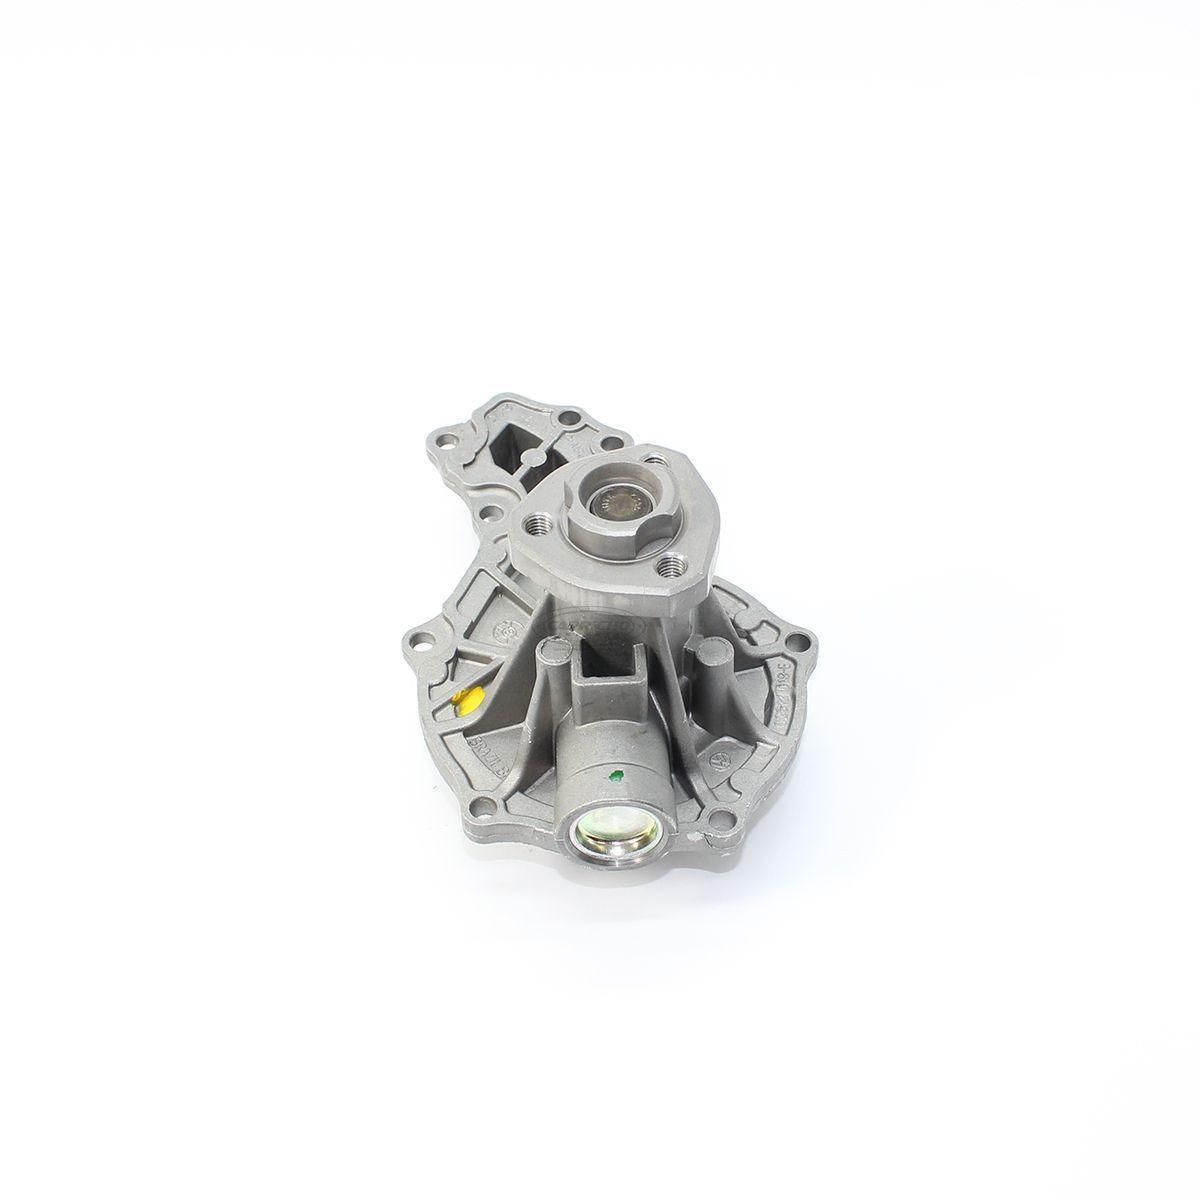 Bomba D'água Volkswagen Gol / Parati / Saveiro / Voyage / Santana / Golf - Motor AP 1.6 1.8 2.0  ORIGINAL